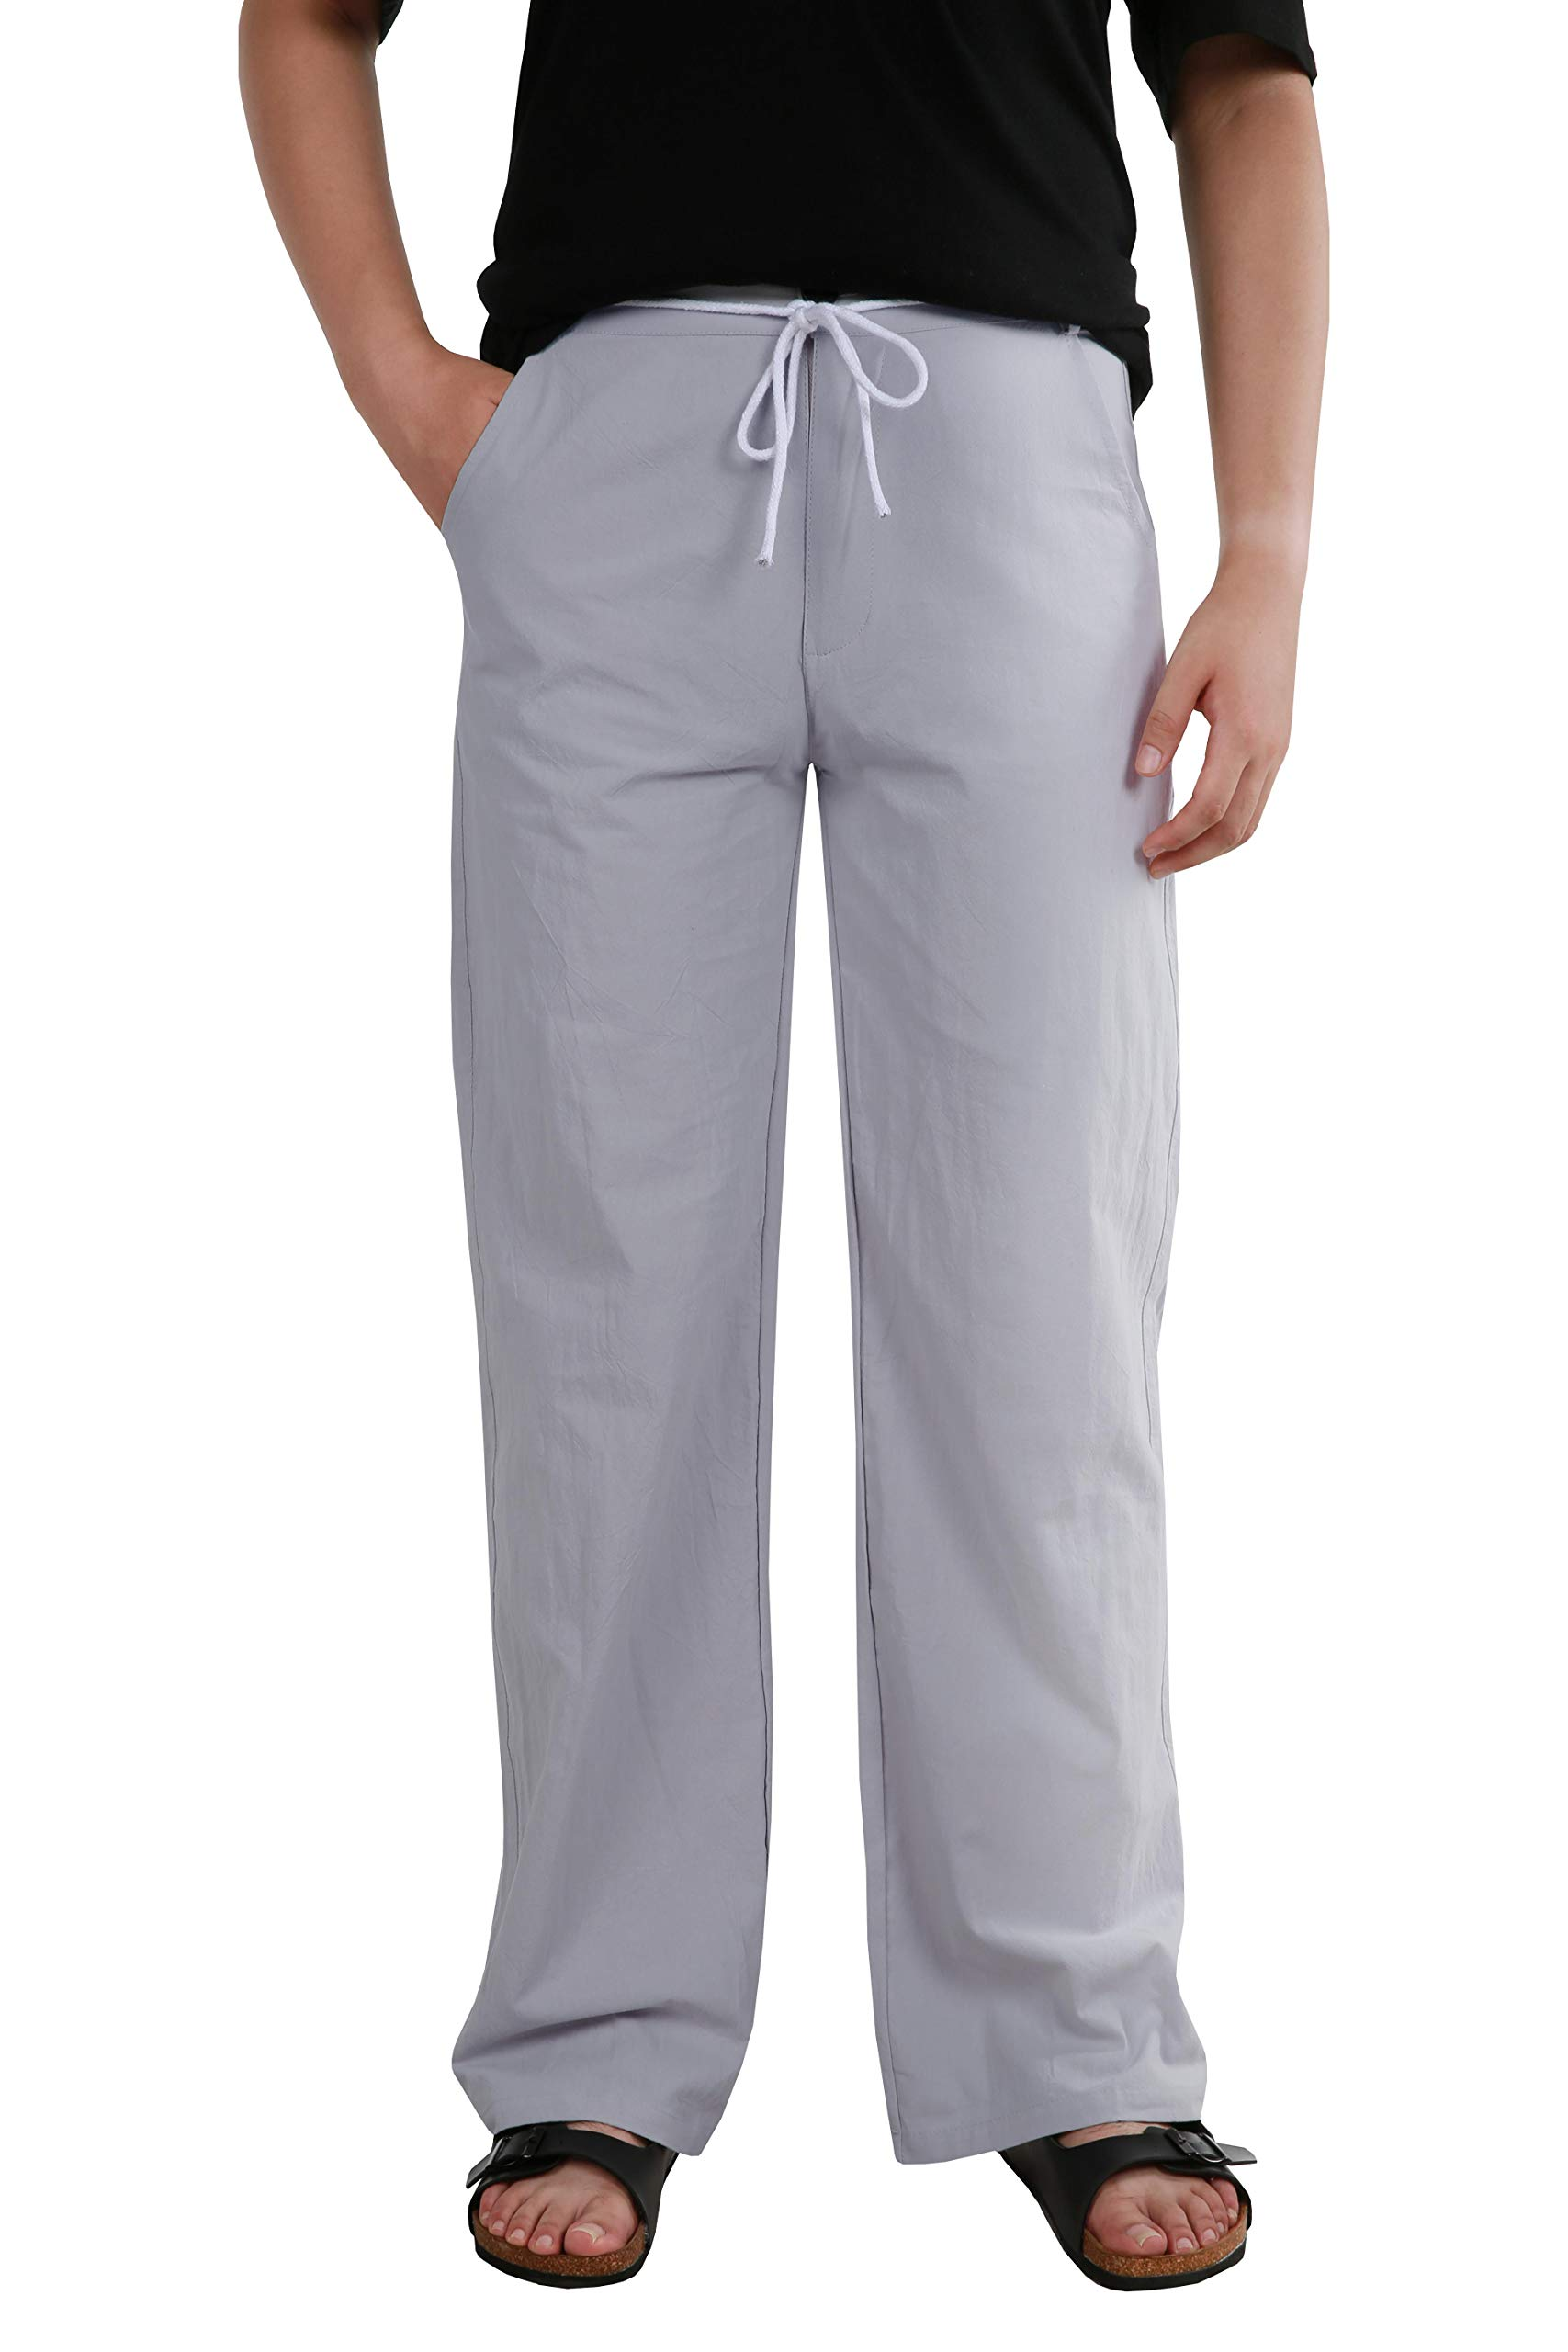 Makkrom Mens Casual Beach Trousers Linen Drawstring Summer Pants